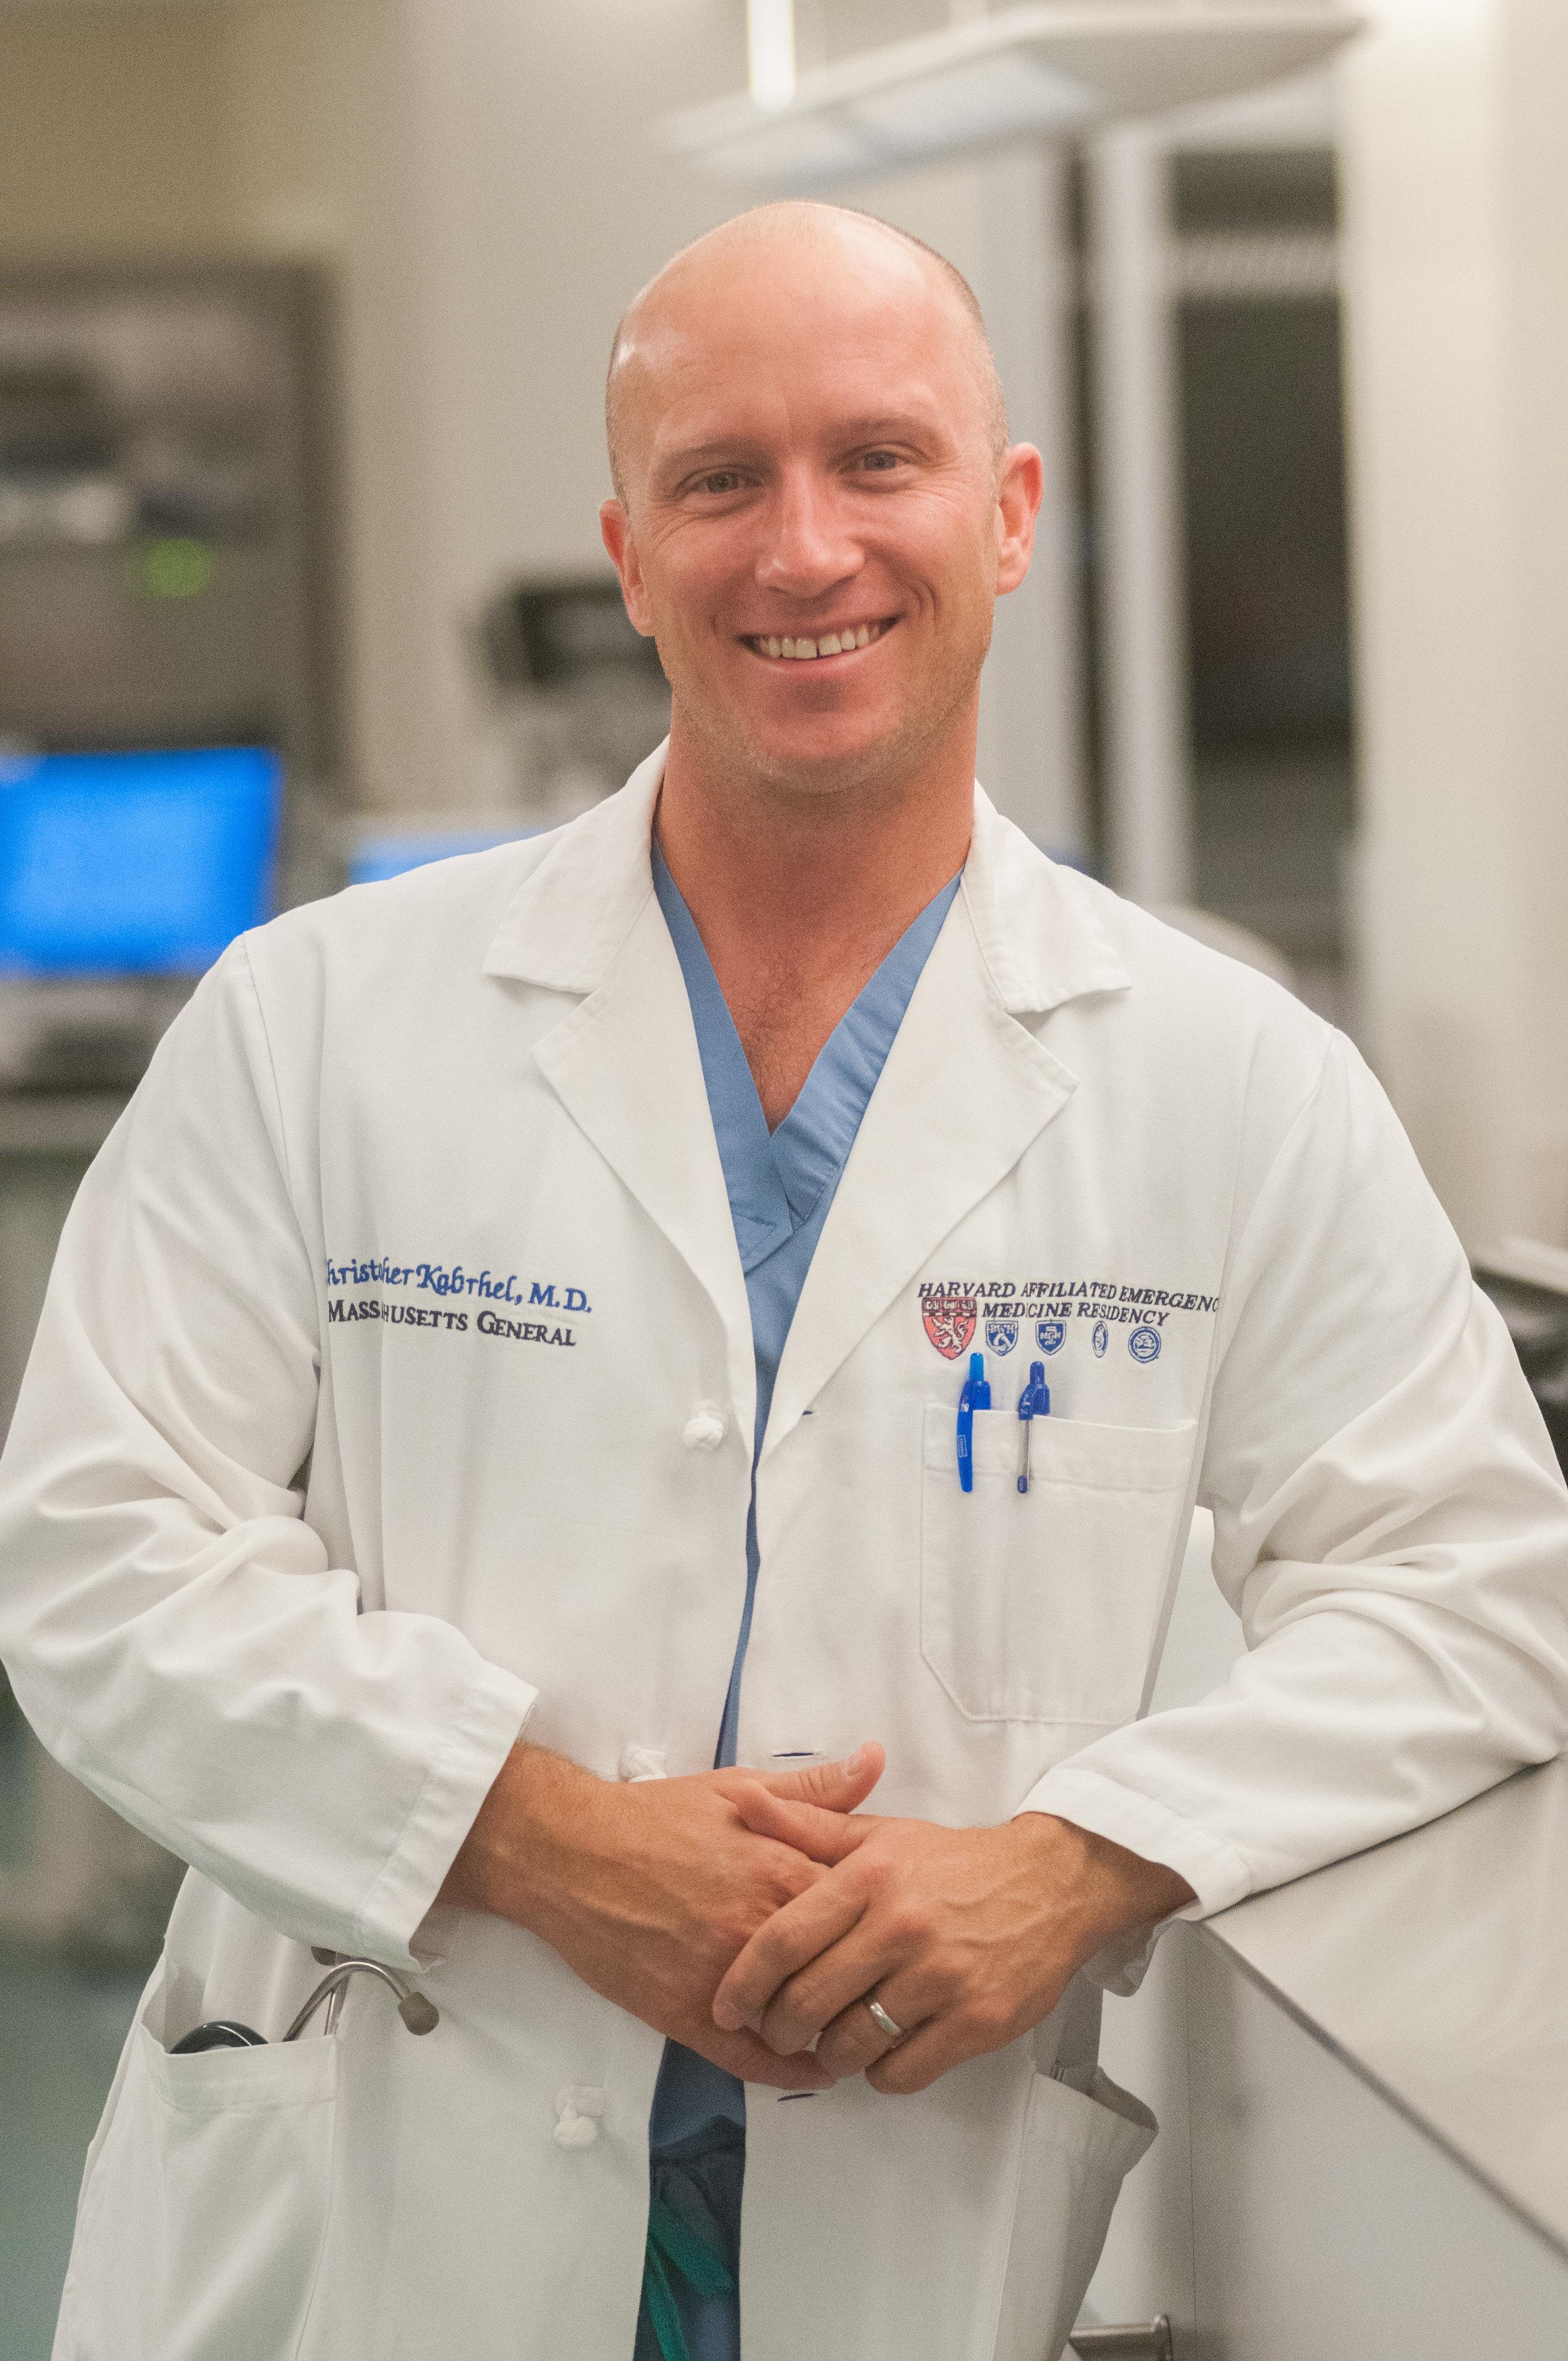 - Christopher Kabrhel MD, MPHAssociate Professor, Harvard Medical SchoolDirector, Center for Vascular EmergenciesDepartment of Emergency MedicineMassachusetts General Hospital